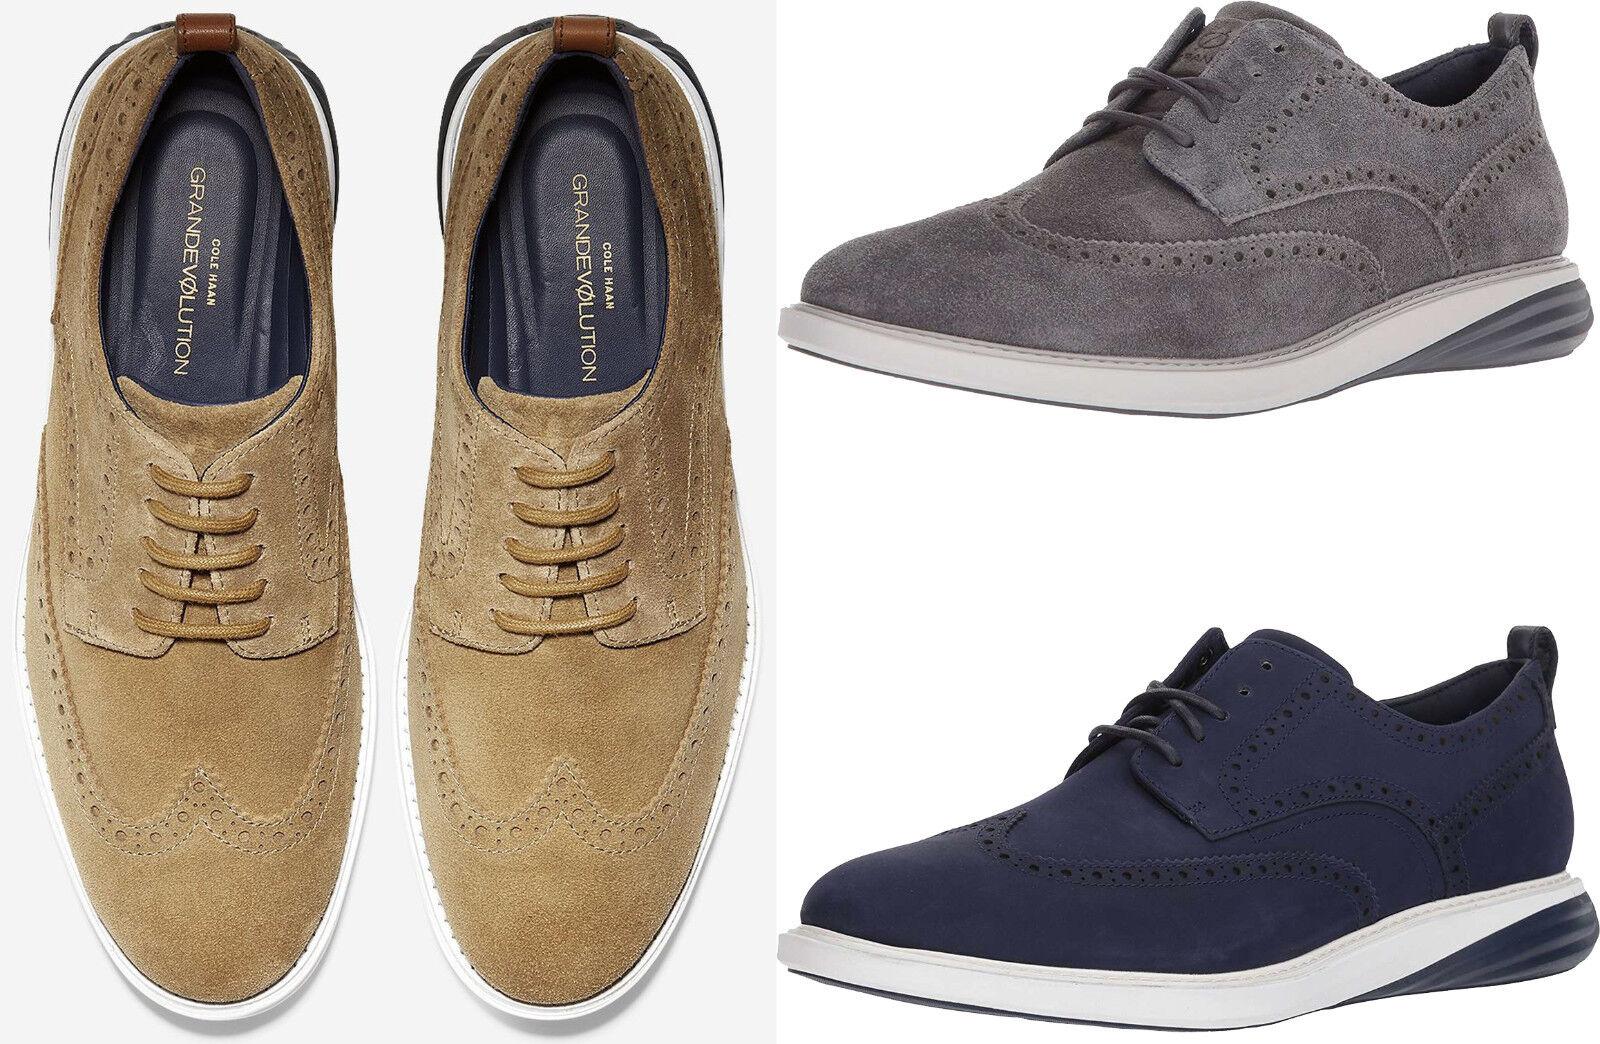 Men Cole Haan GrandEvolution Wingtip Oxford Shoes Brogue Oxfords NEW